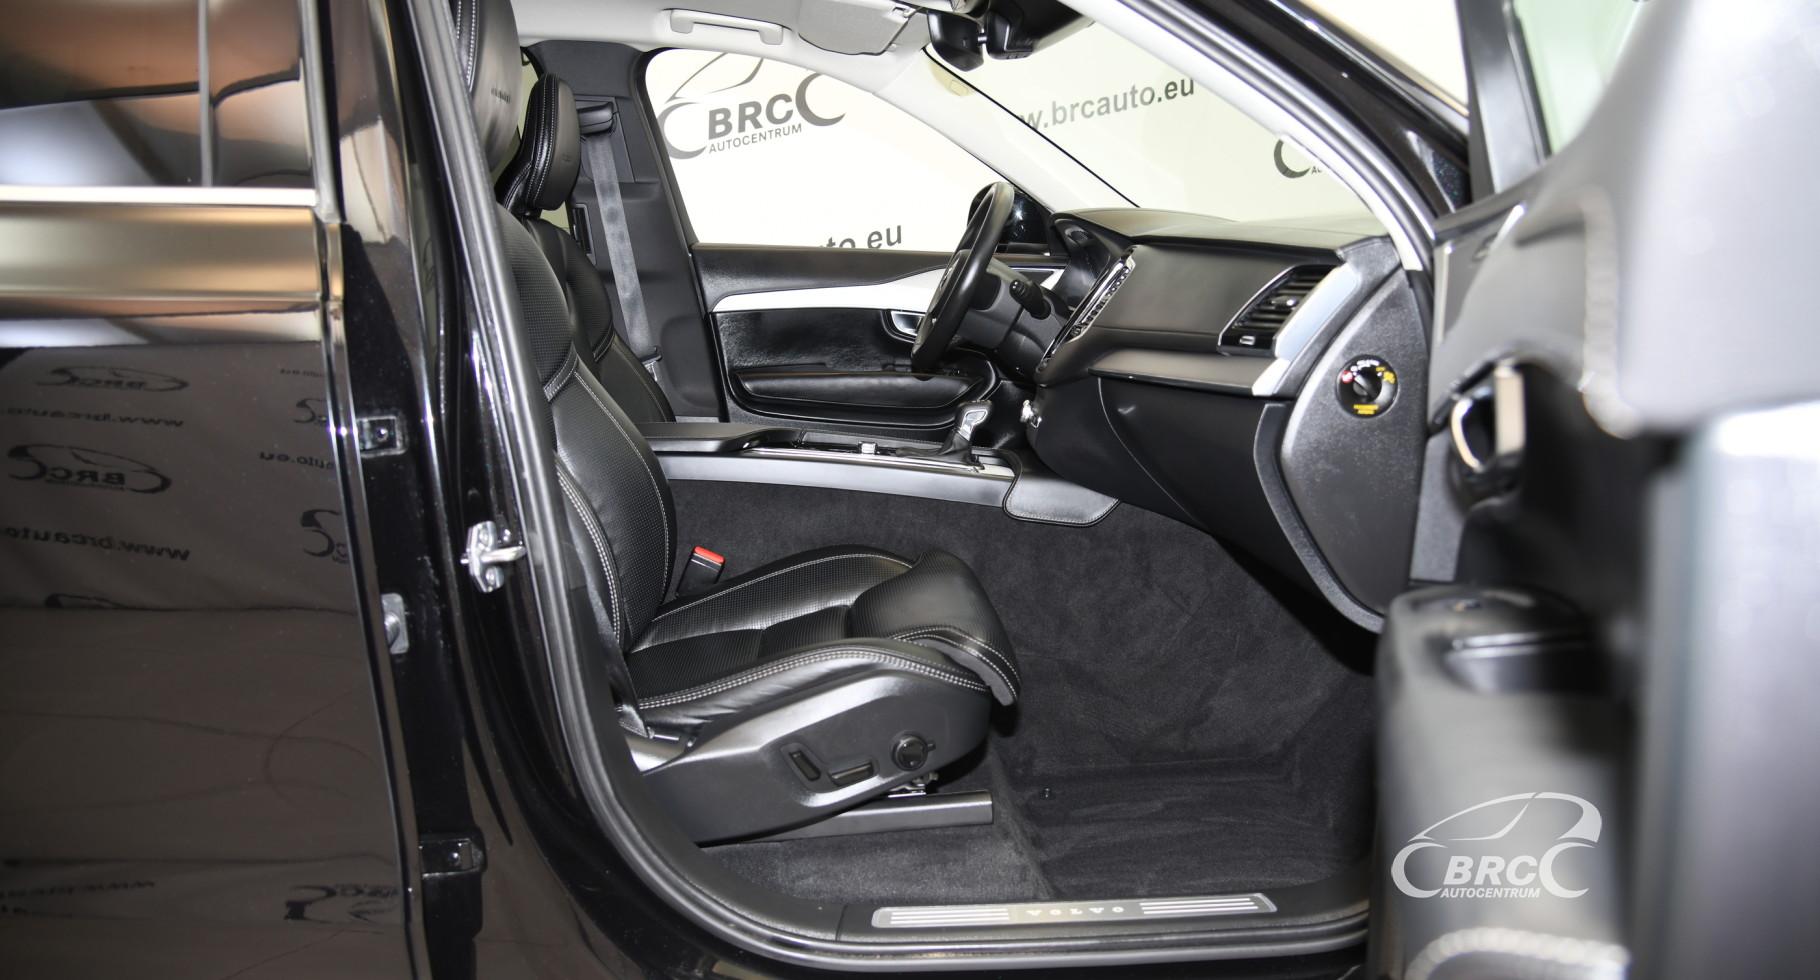 Volvo XC 90 2.0 D5 AWD Inscription Automatas